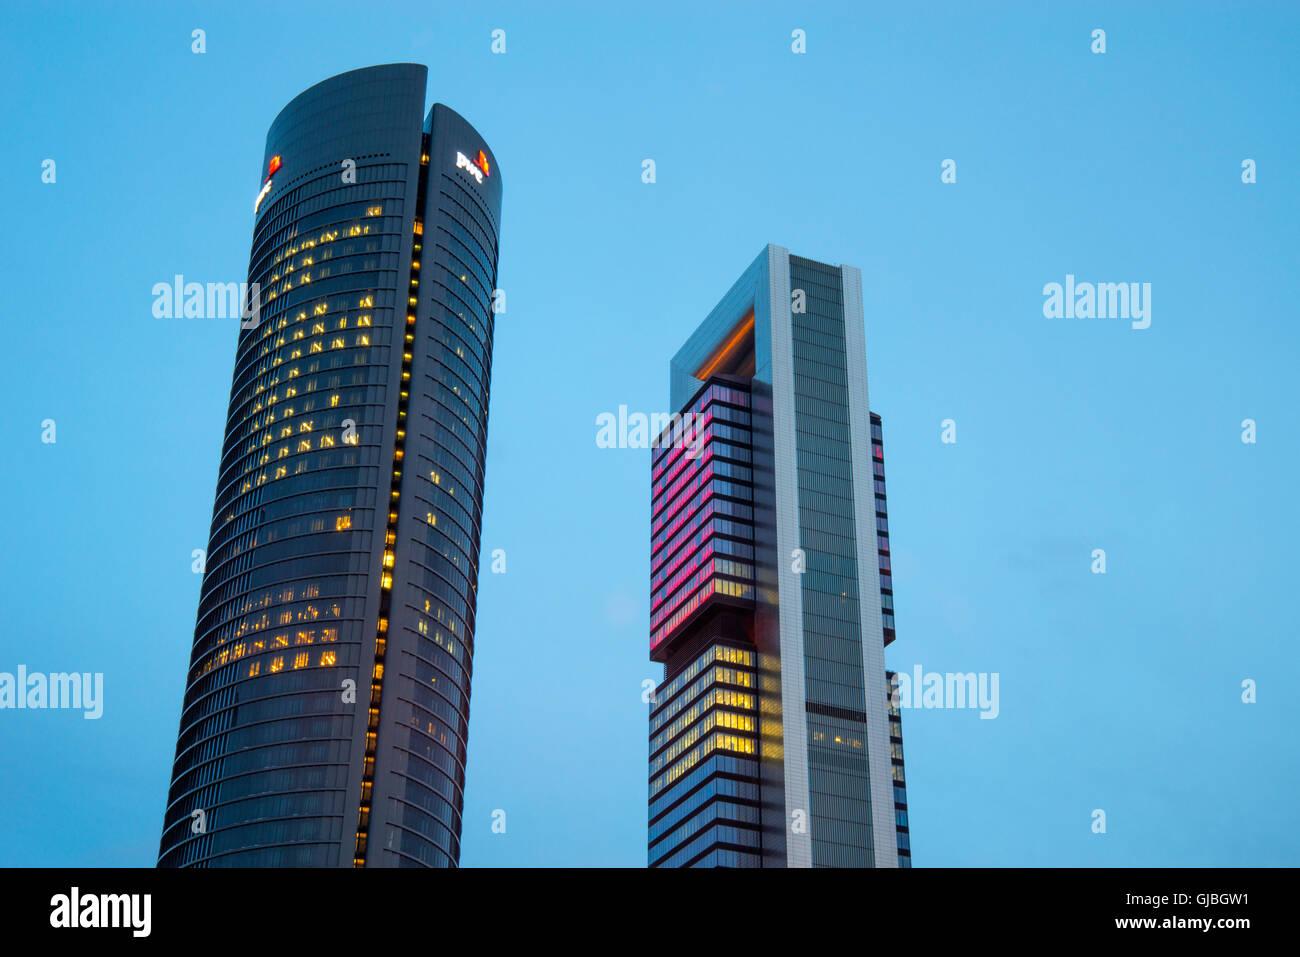 Edificio oficinas im genes de stock edificio oficinas for Buscador oficinas bankia